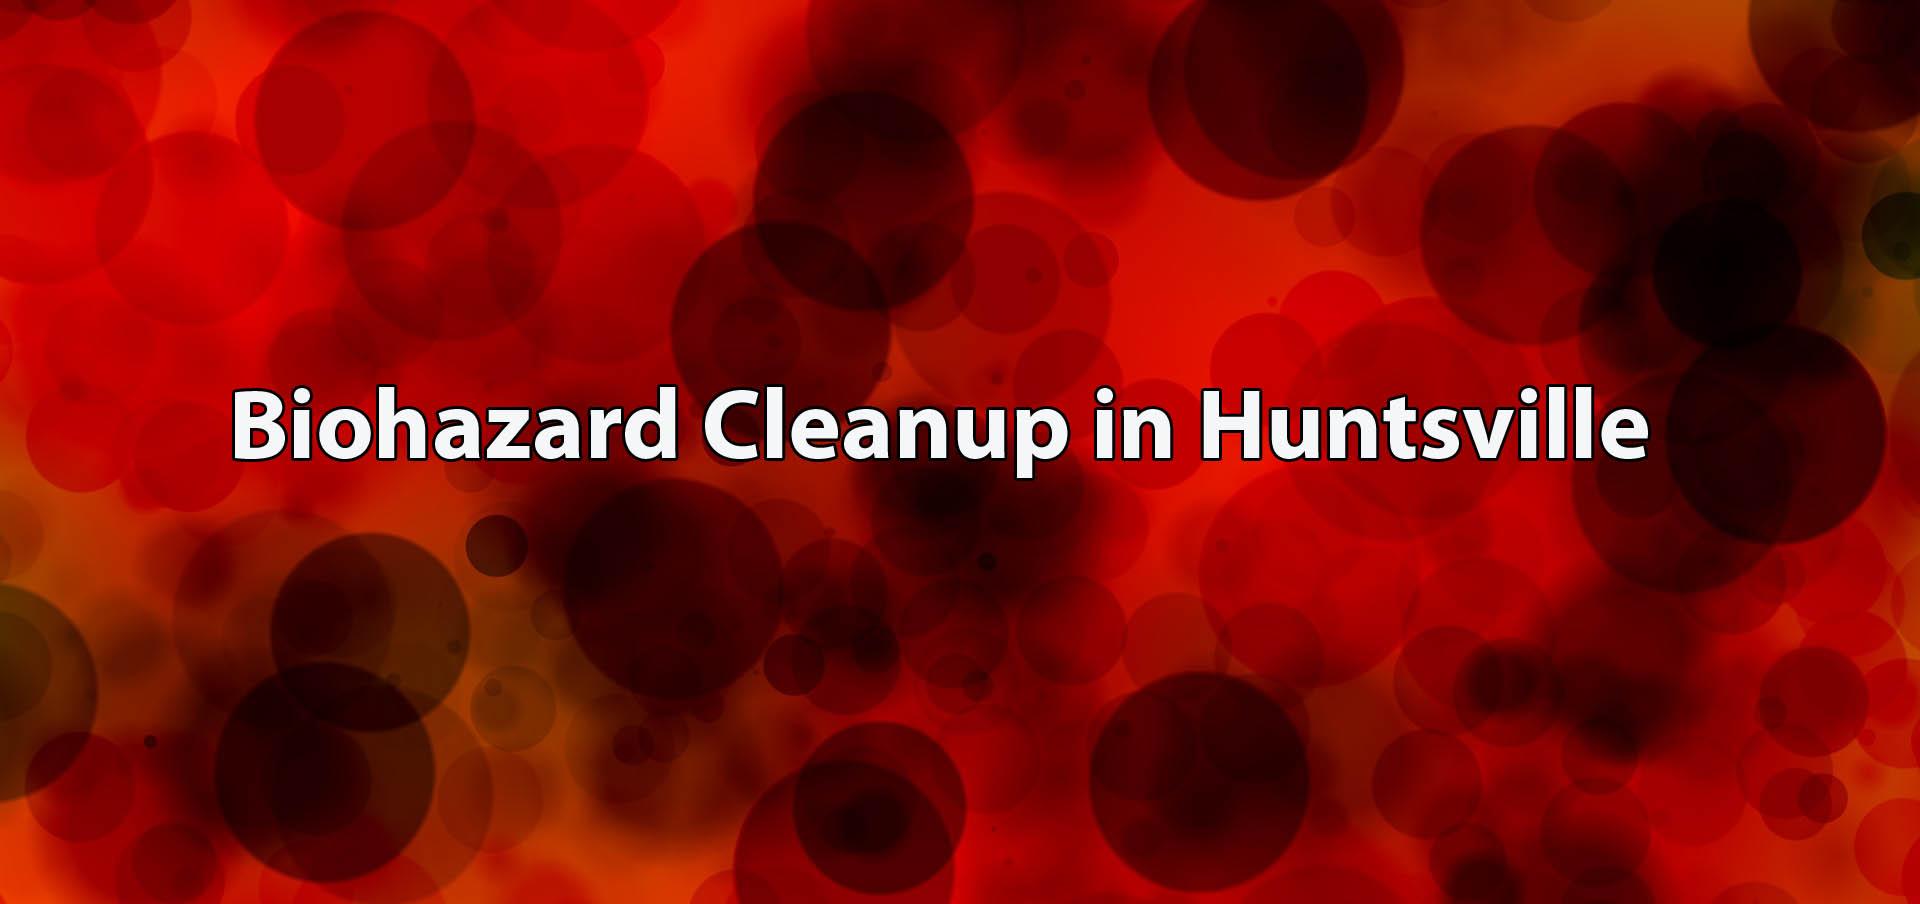 Biohazard Cleanup in Huntsville AL - Huntsville Biohazard Response -